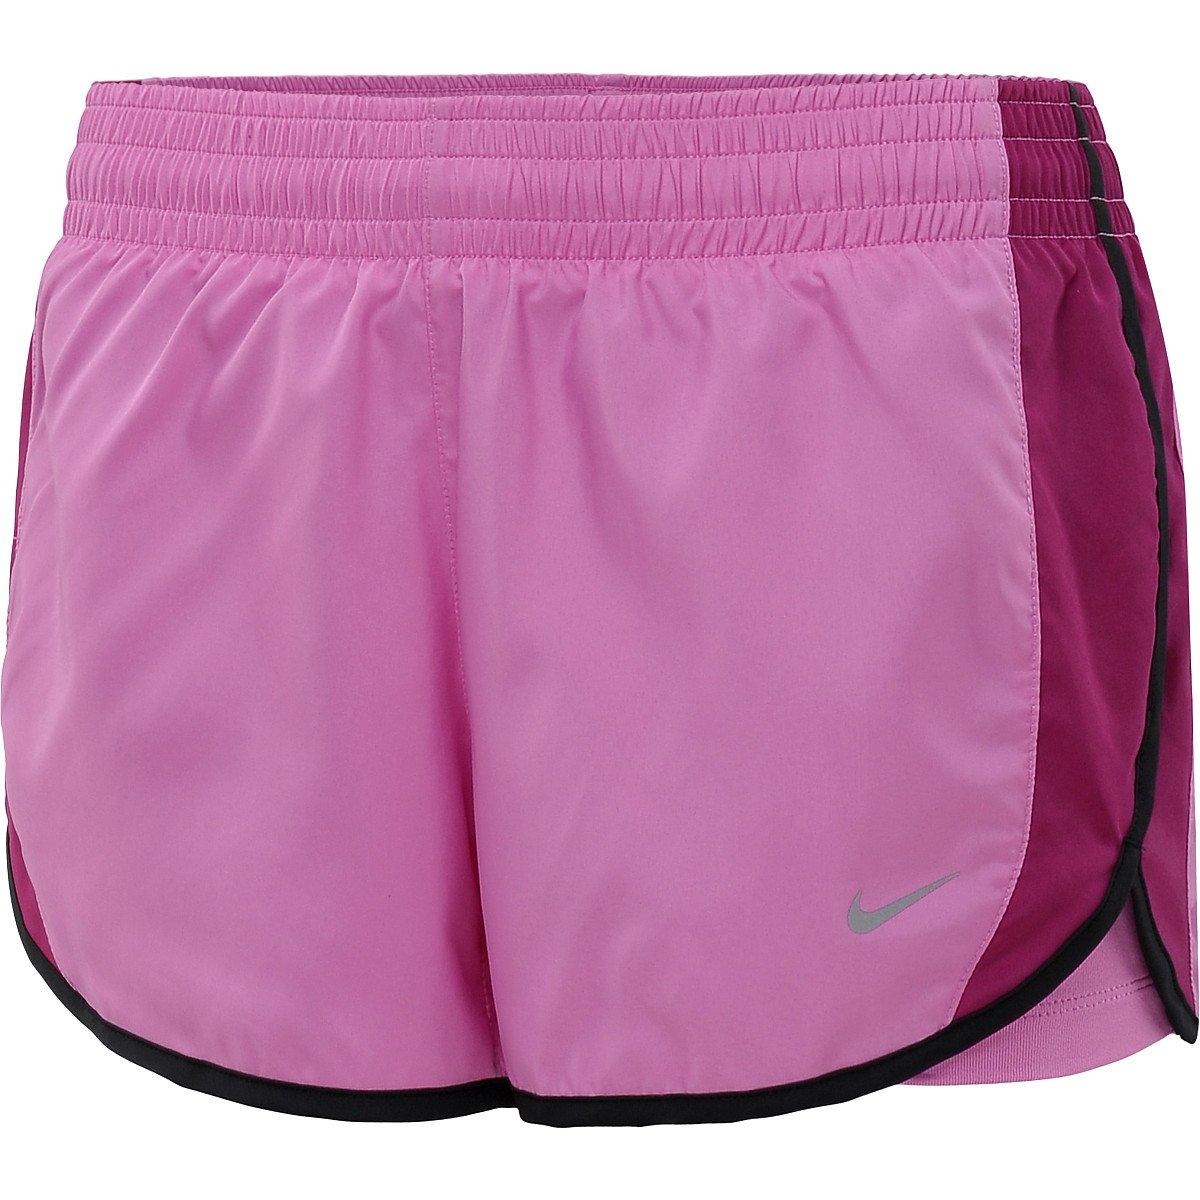 Nike Women's Tempo Running Shorts Pink